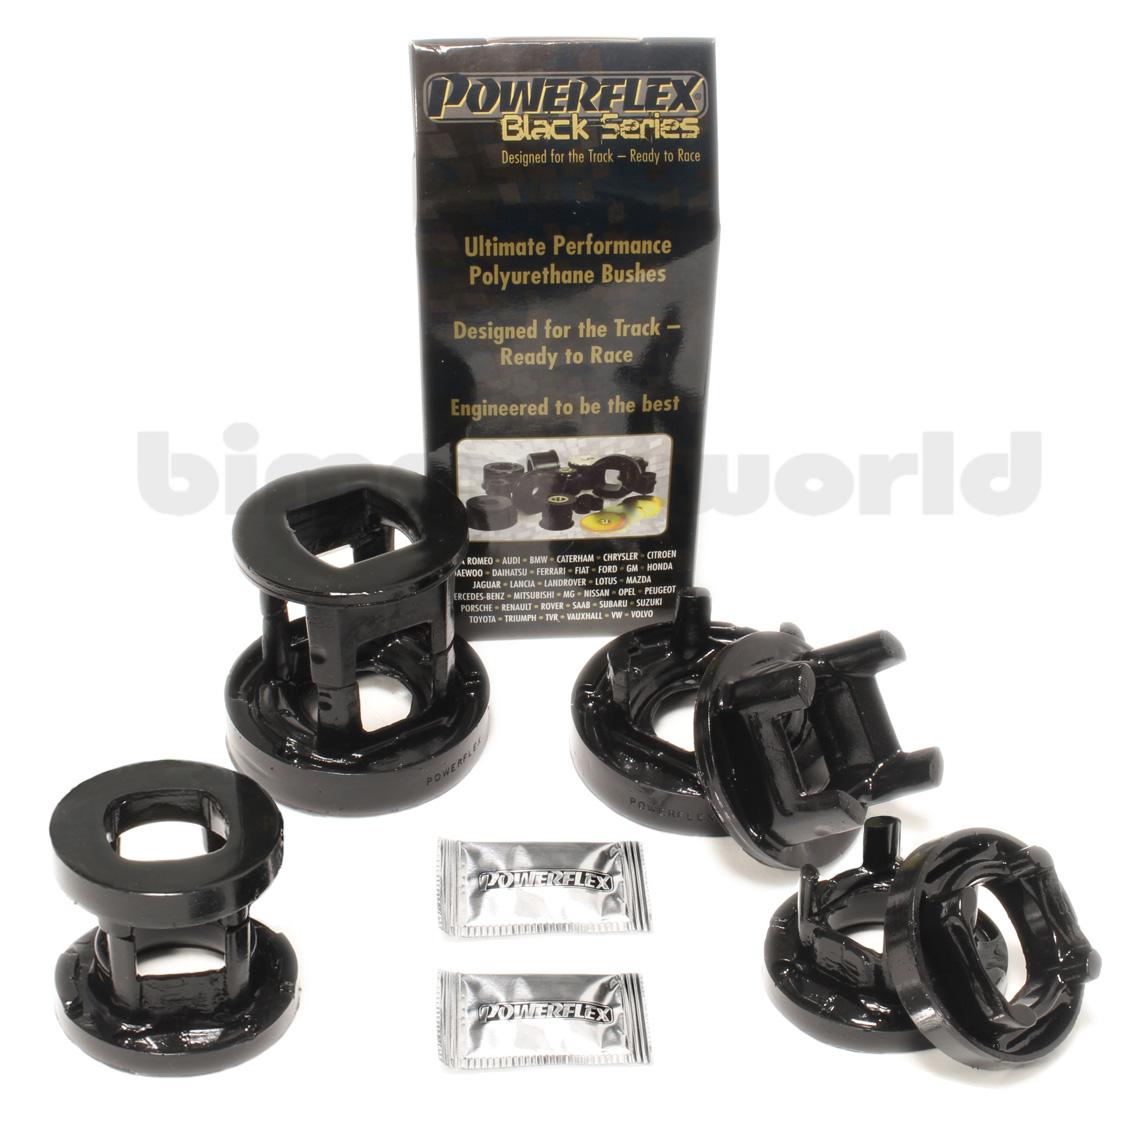 Powerflex Urethane Track-Series Rear Subframe Inserts - E90 335d, E91 all